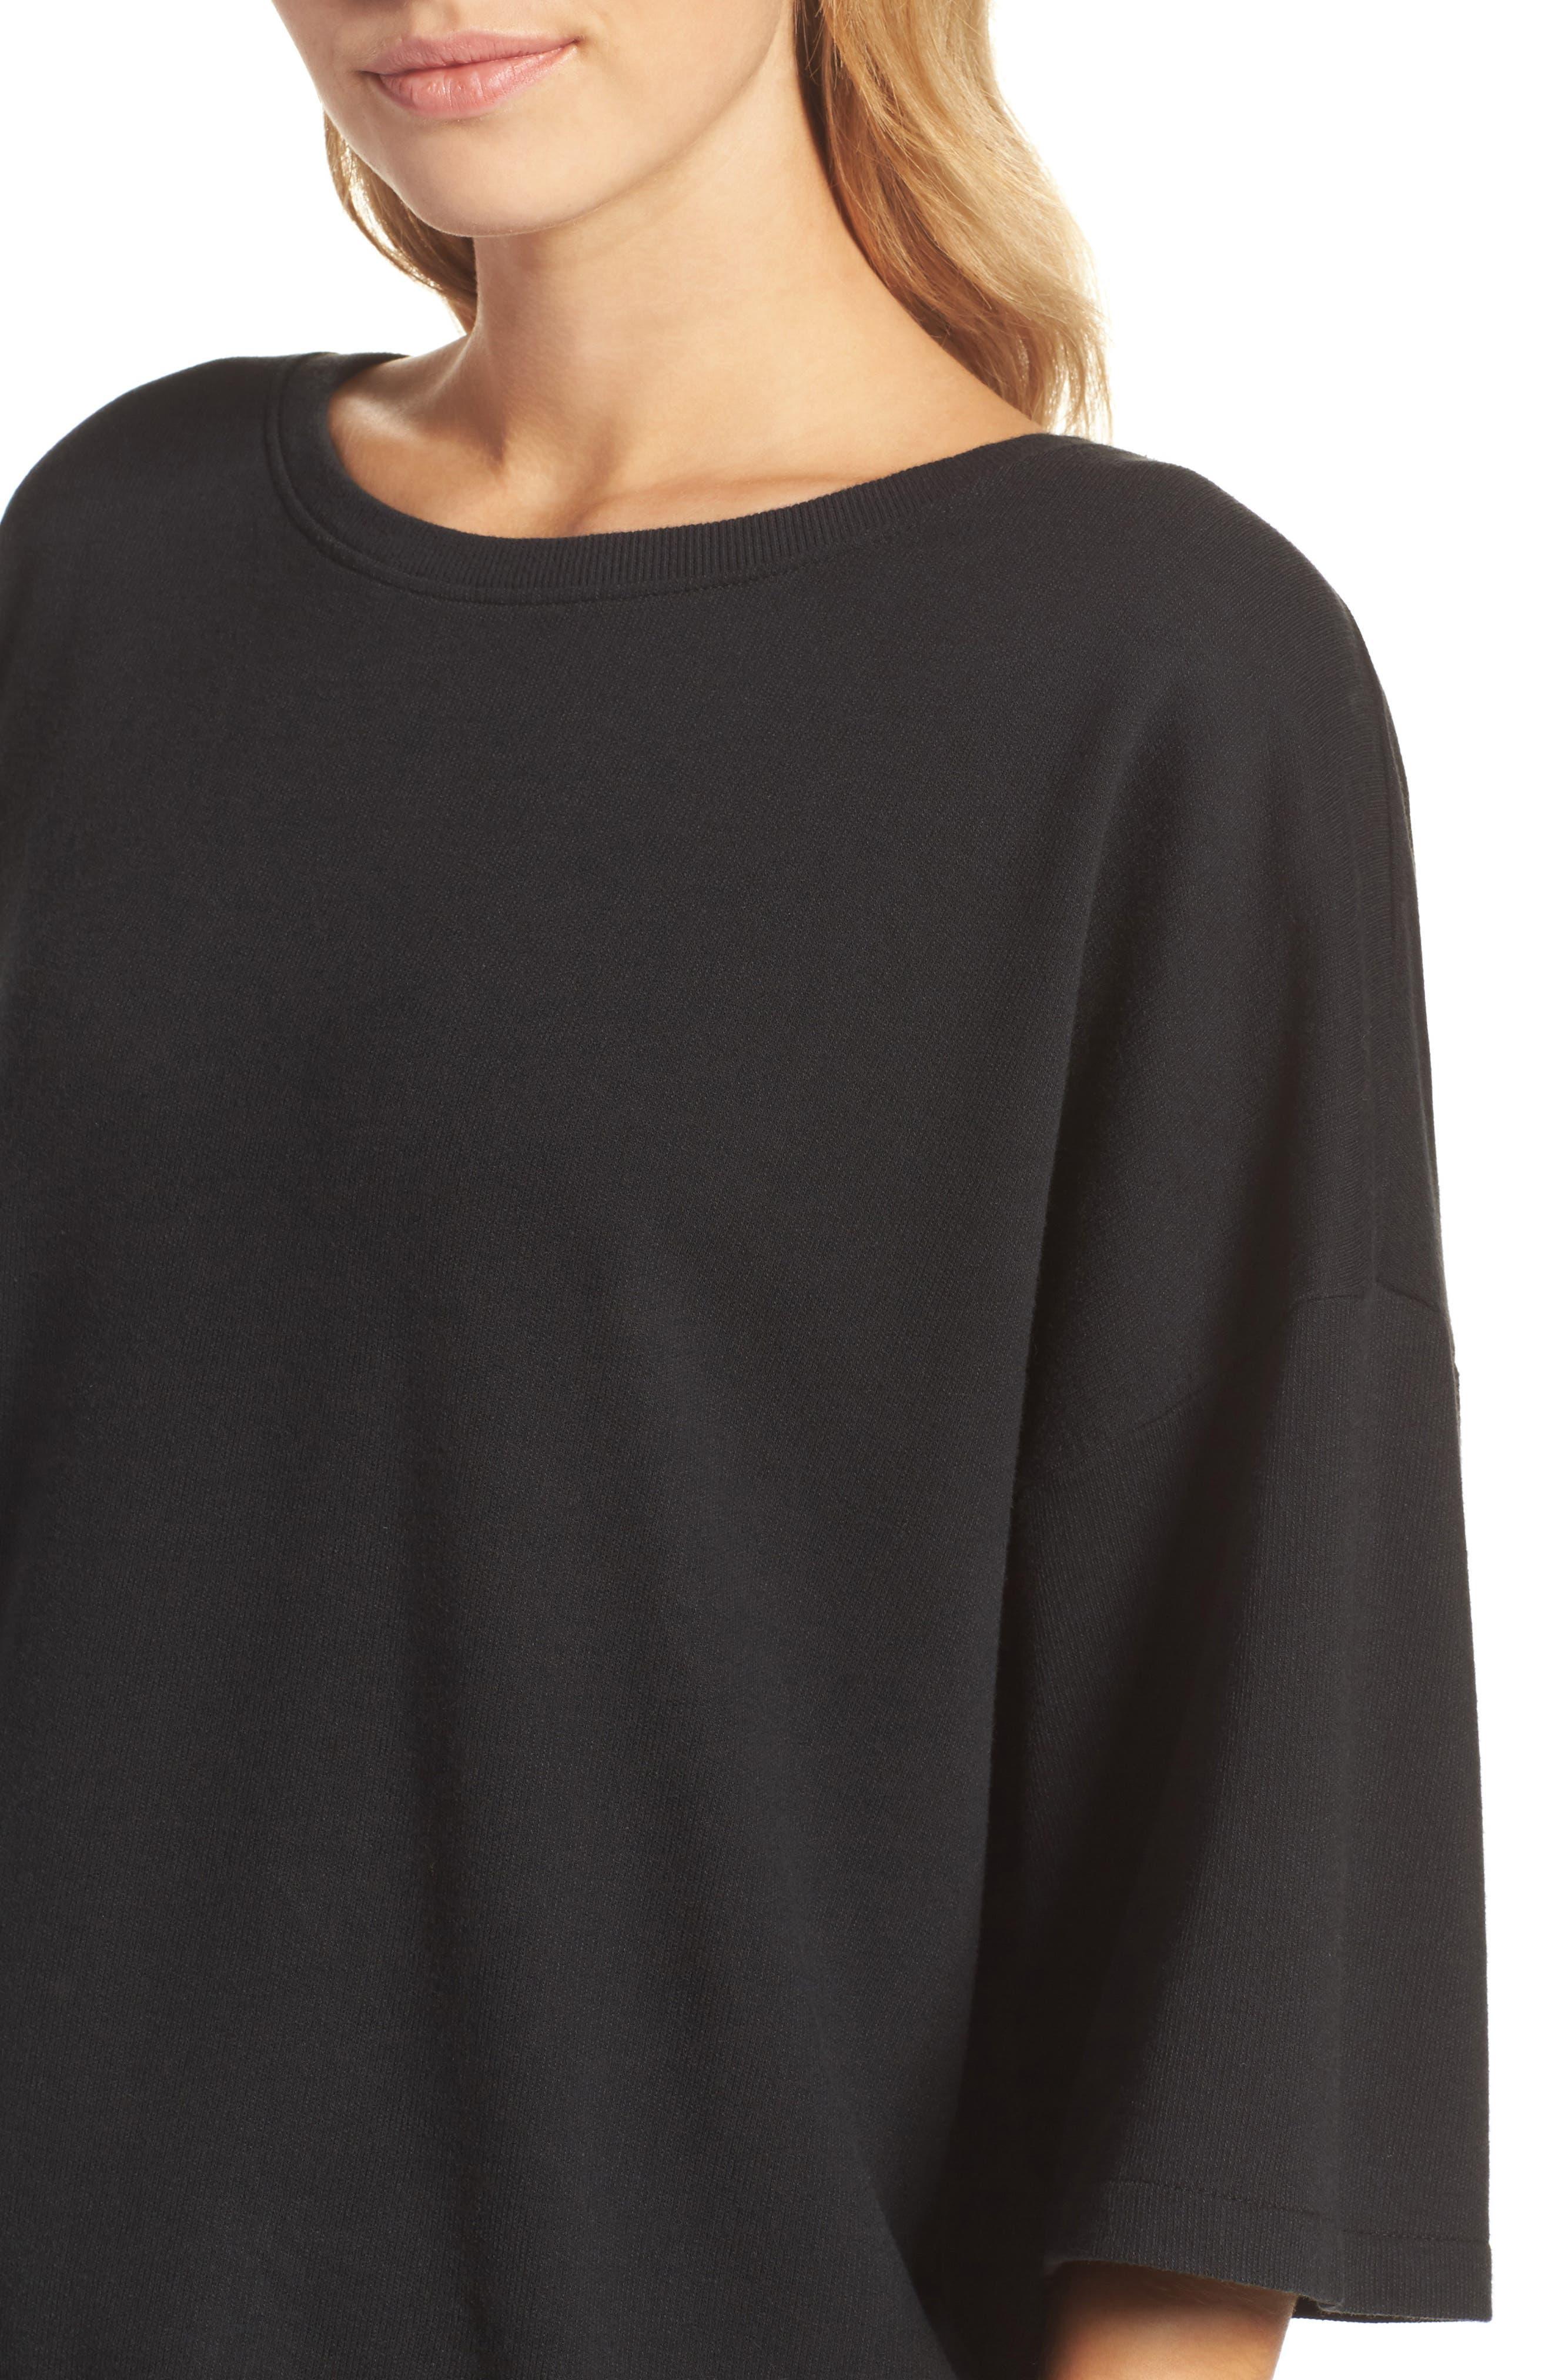 Soph Lounge Sweater,                             Alternate thumbnail 6, color,                             Plain Black Marle